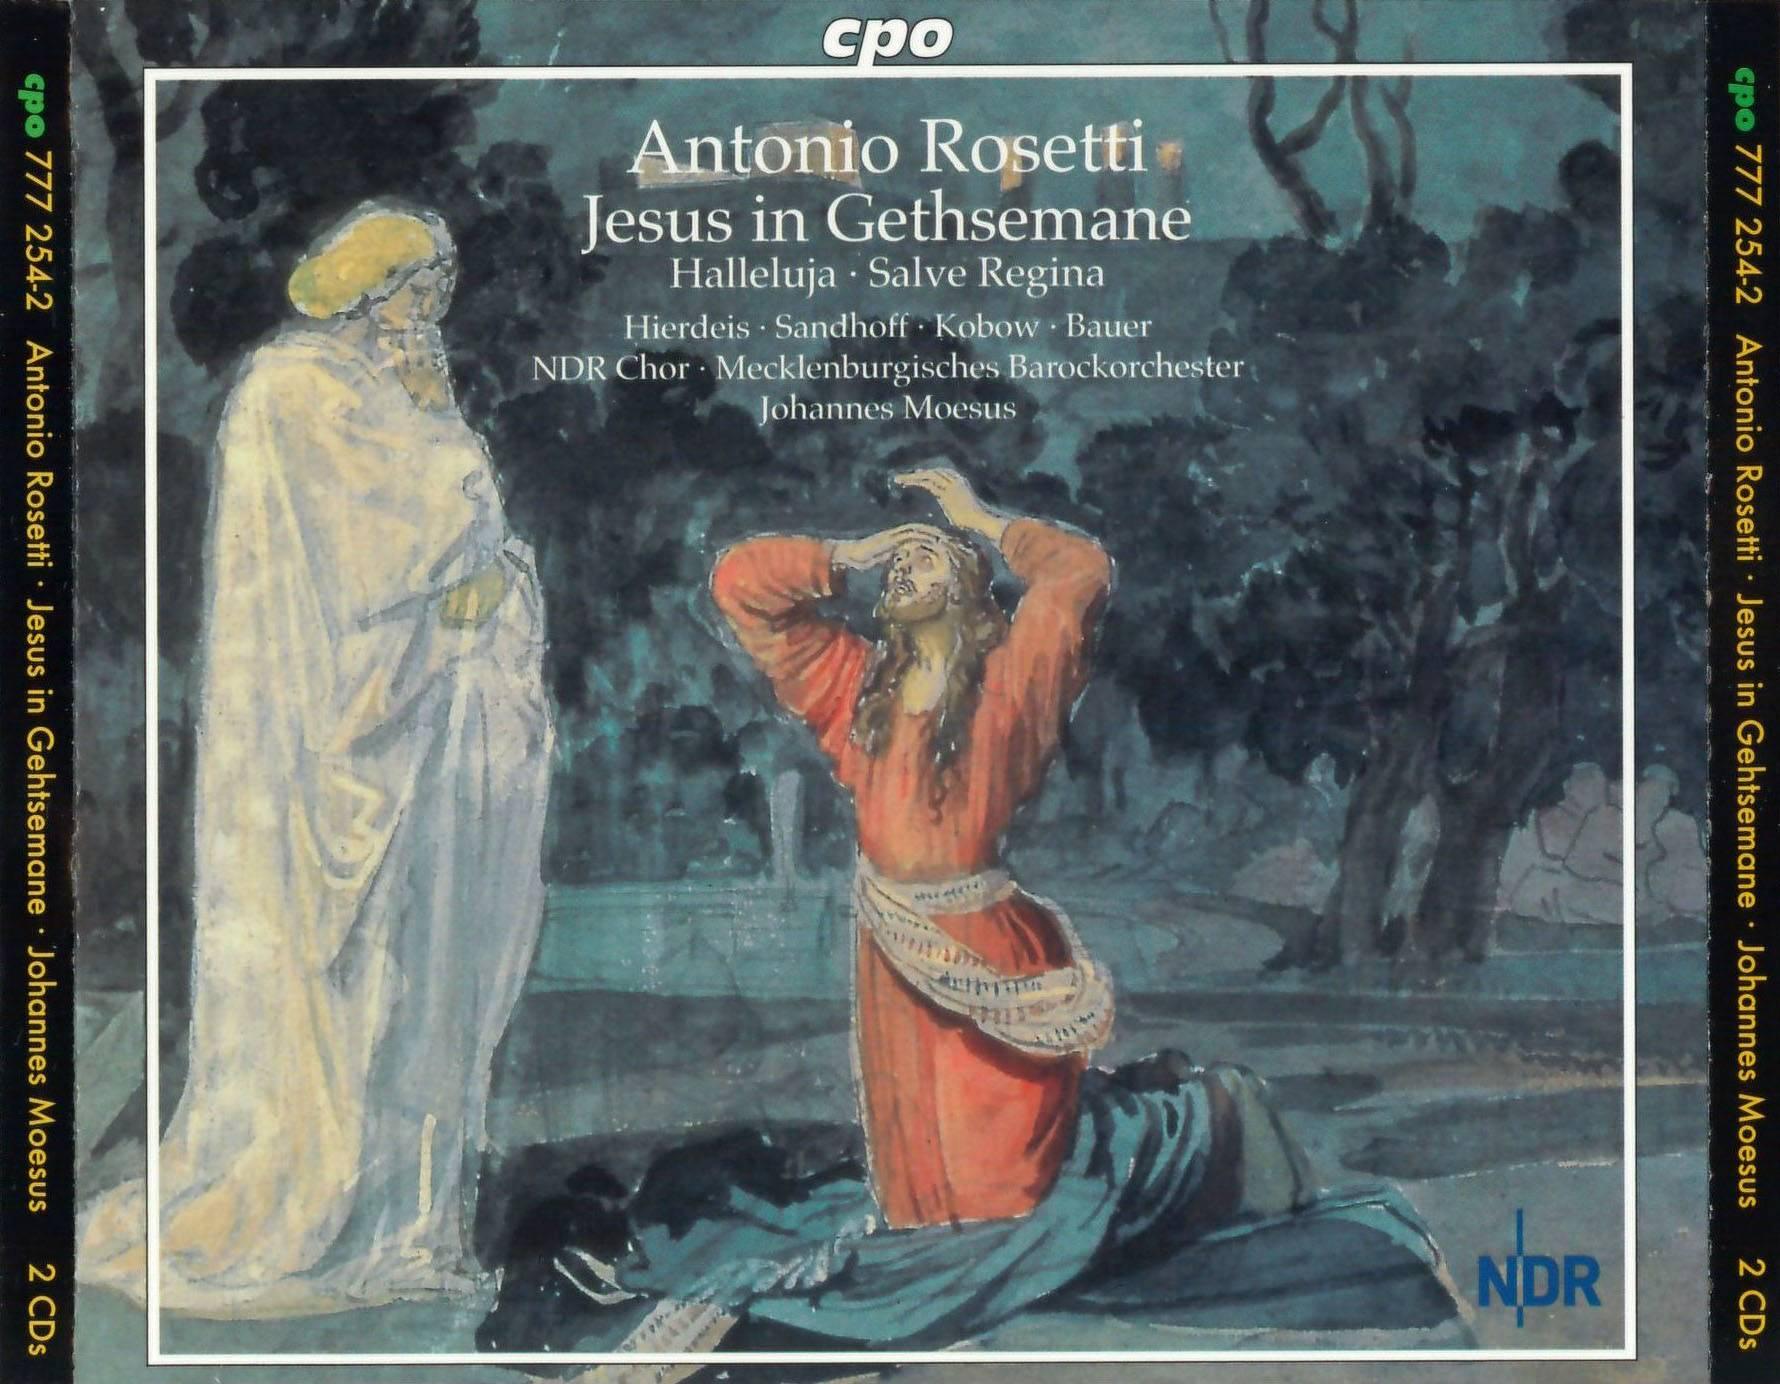 Johannes Moesus - Antonio Rosetti: Jesus in Gethsemane; Halleluja; Salve Regina (2008) 2 CDs